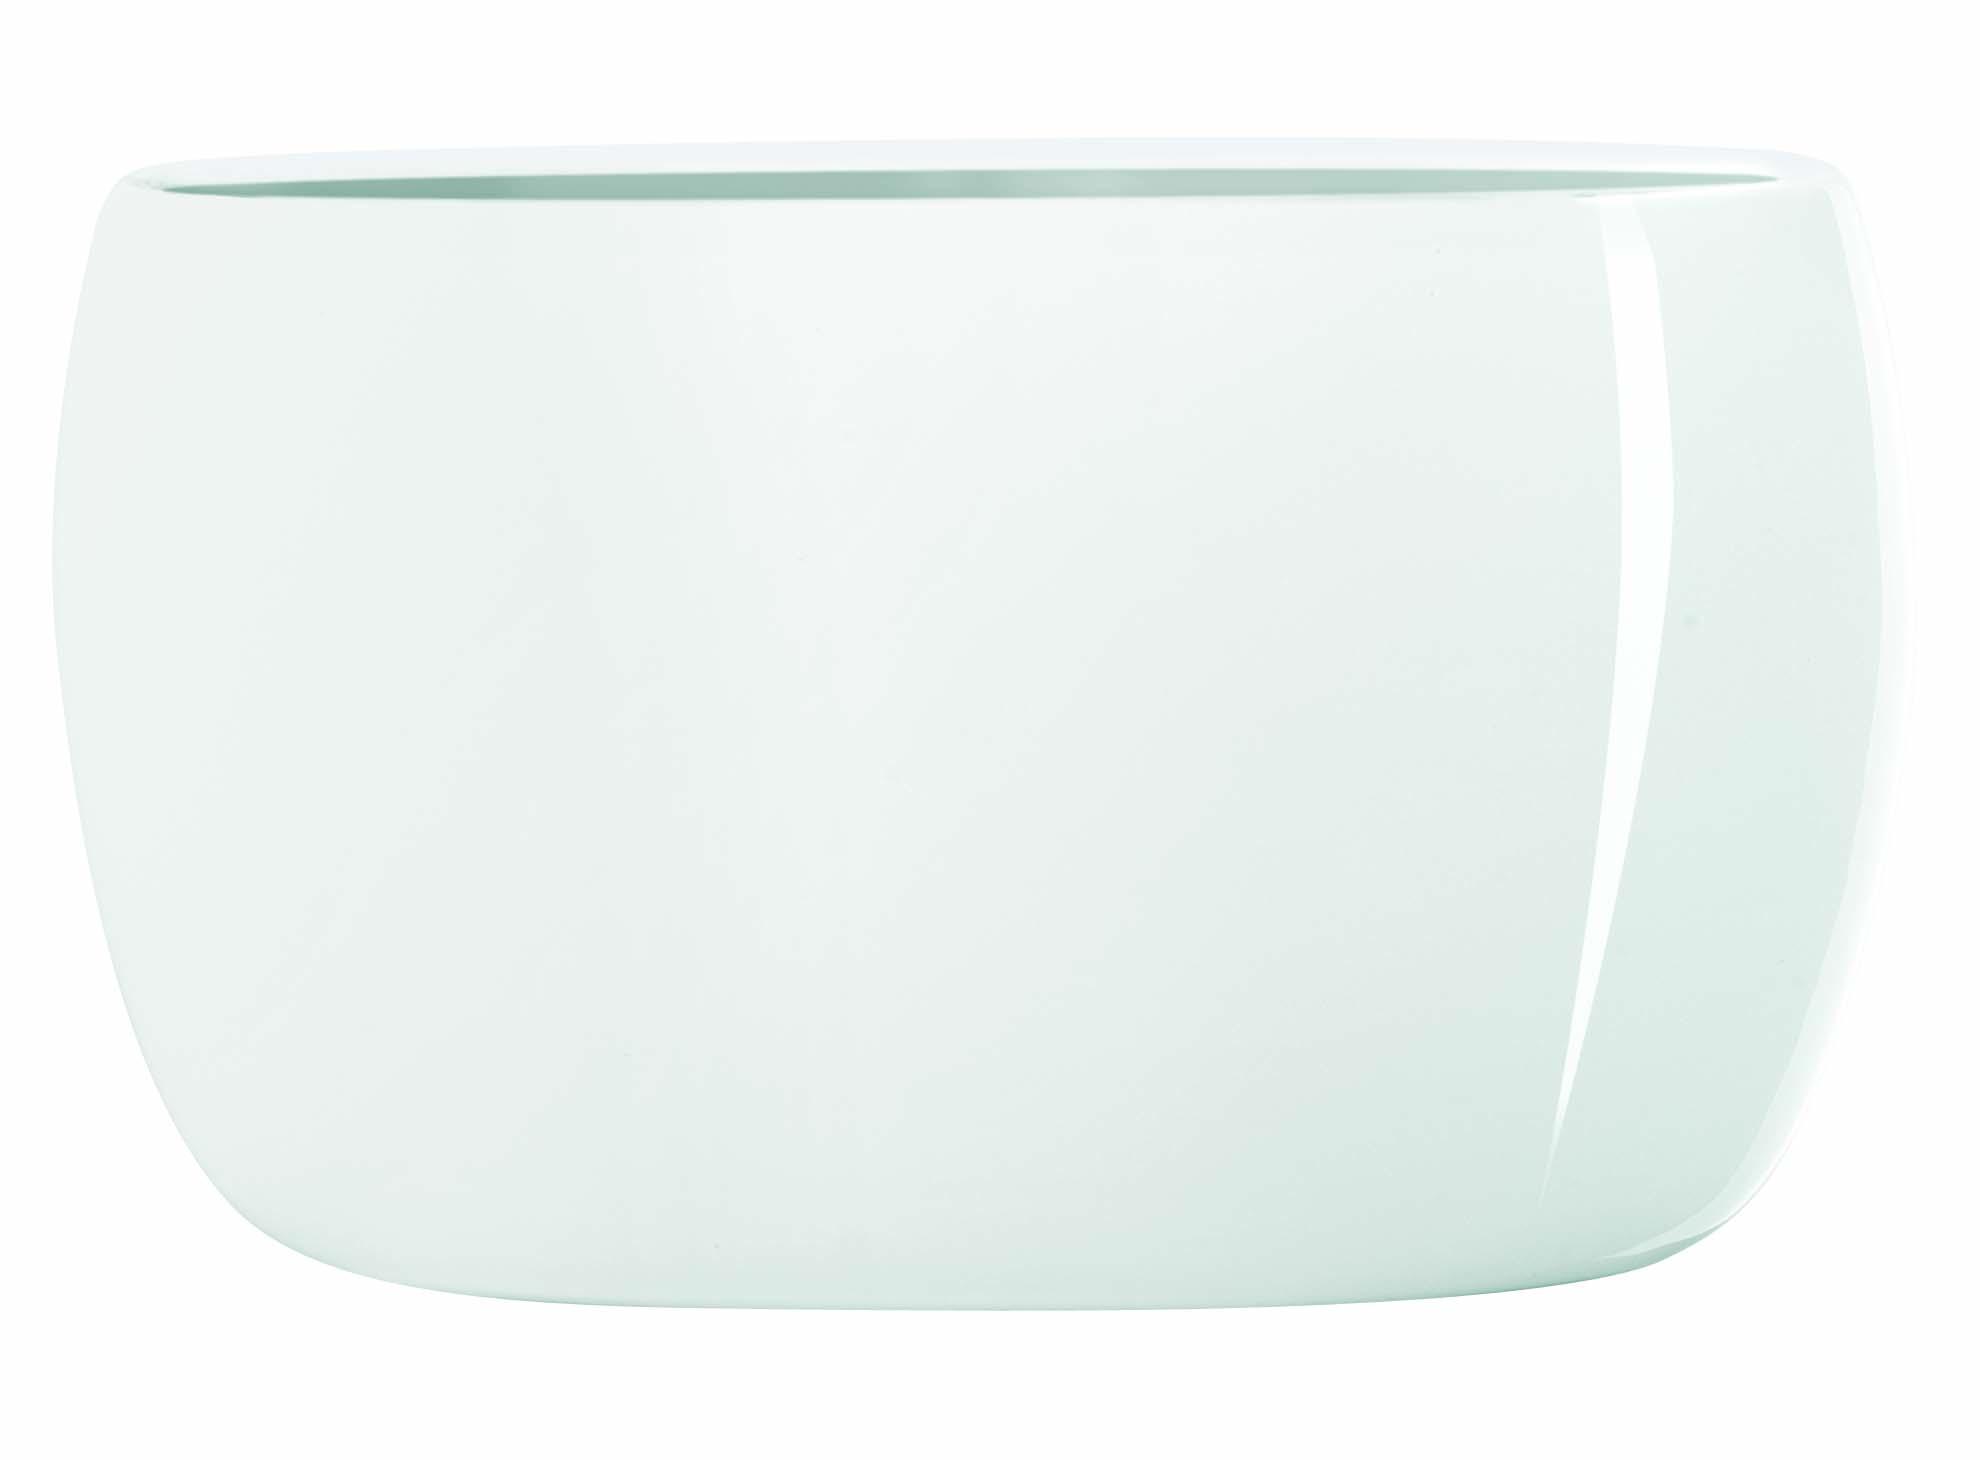 vase wei tischvasen vasen bert pfe produkte home by asa die asa selection wohnwelten. Black Bedroom Furniture Sets. Home Design Ideas